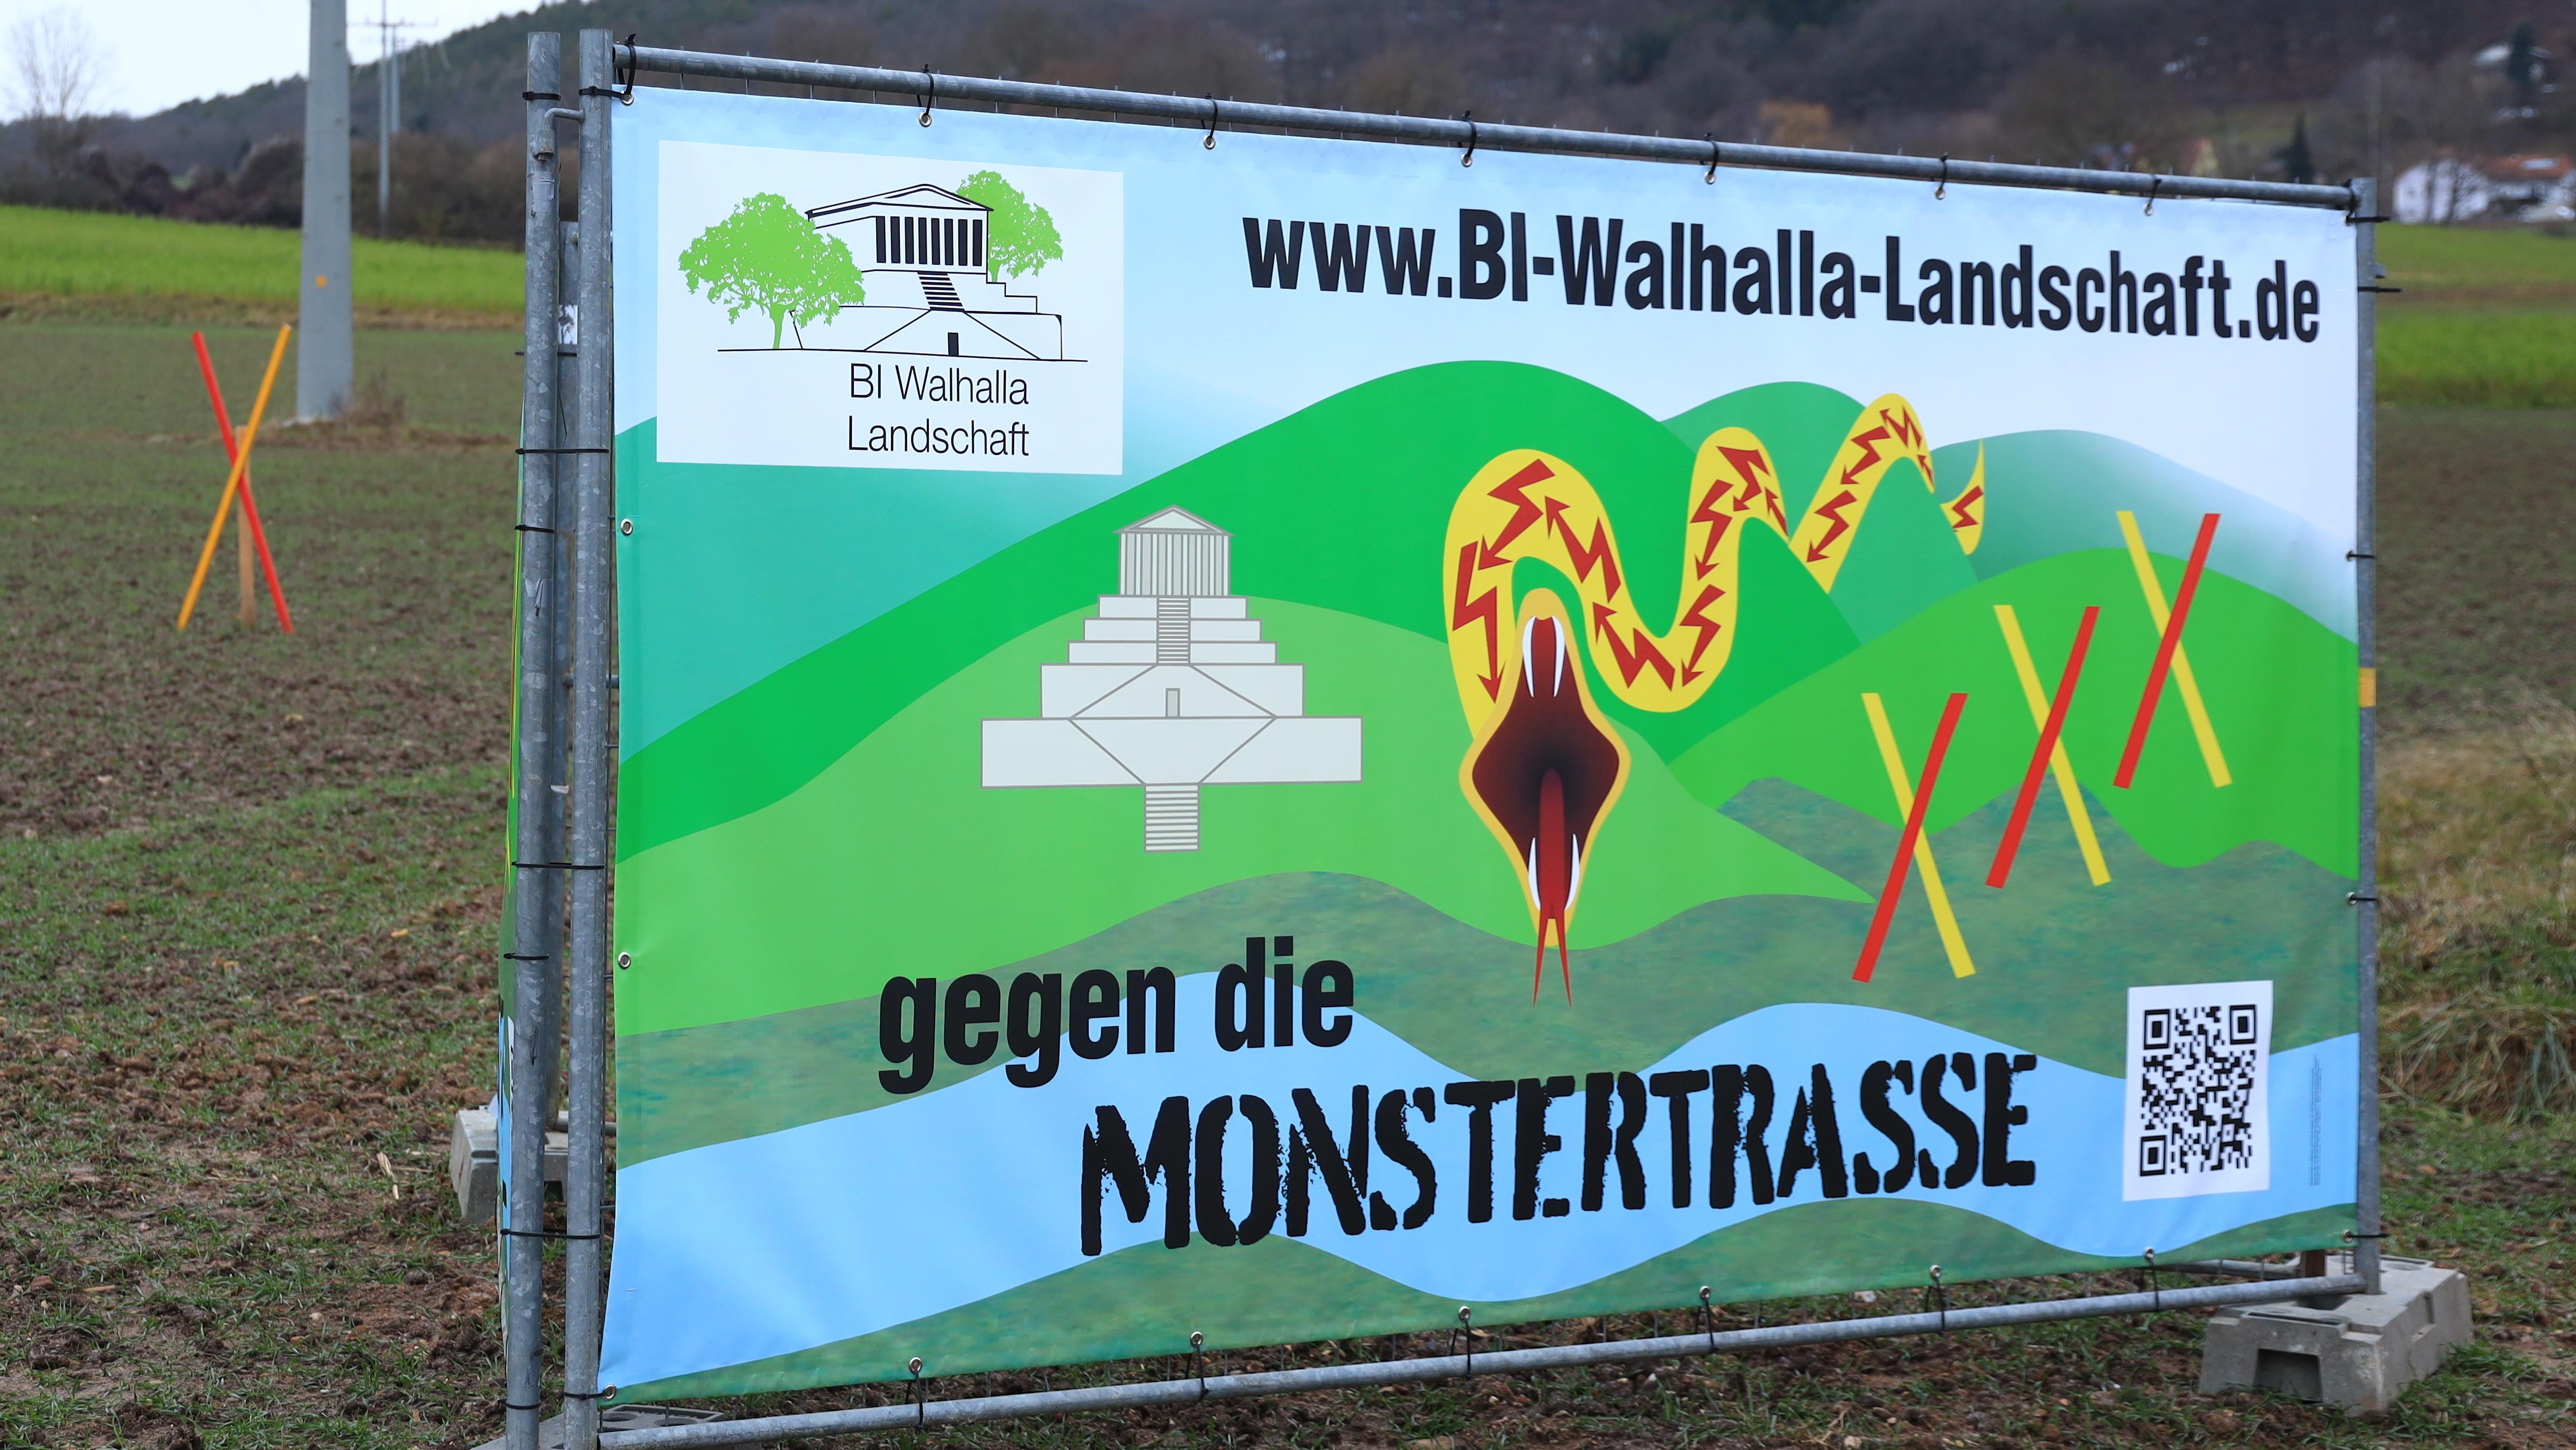 Protest-Transparent bei Sulzbach an der Donau